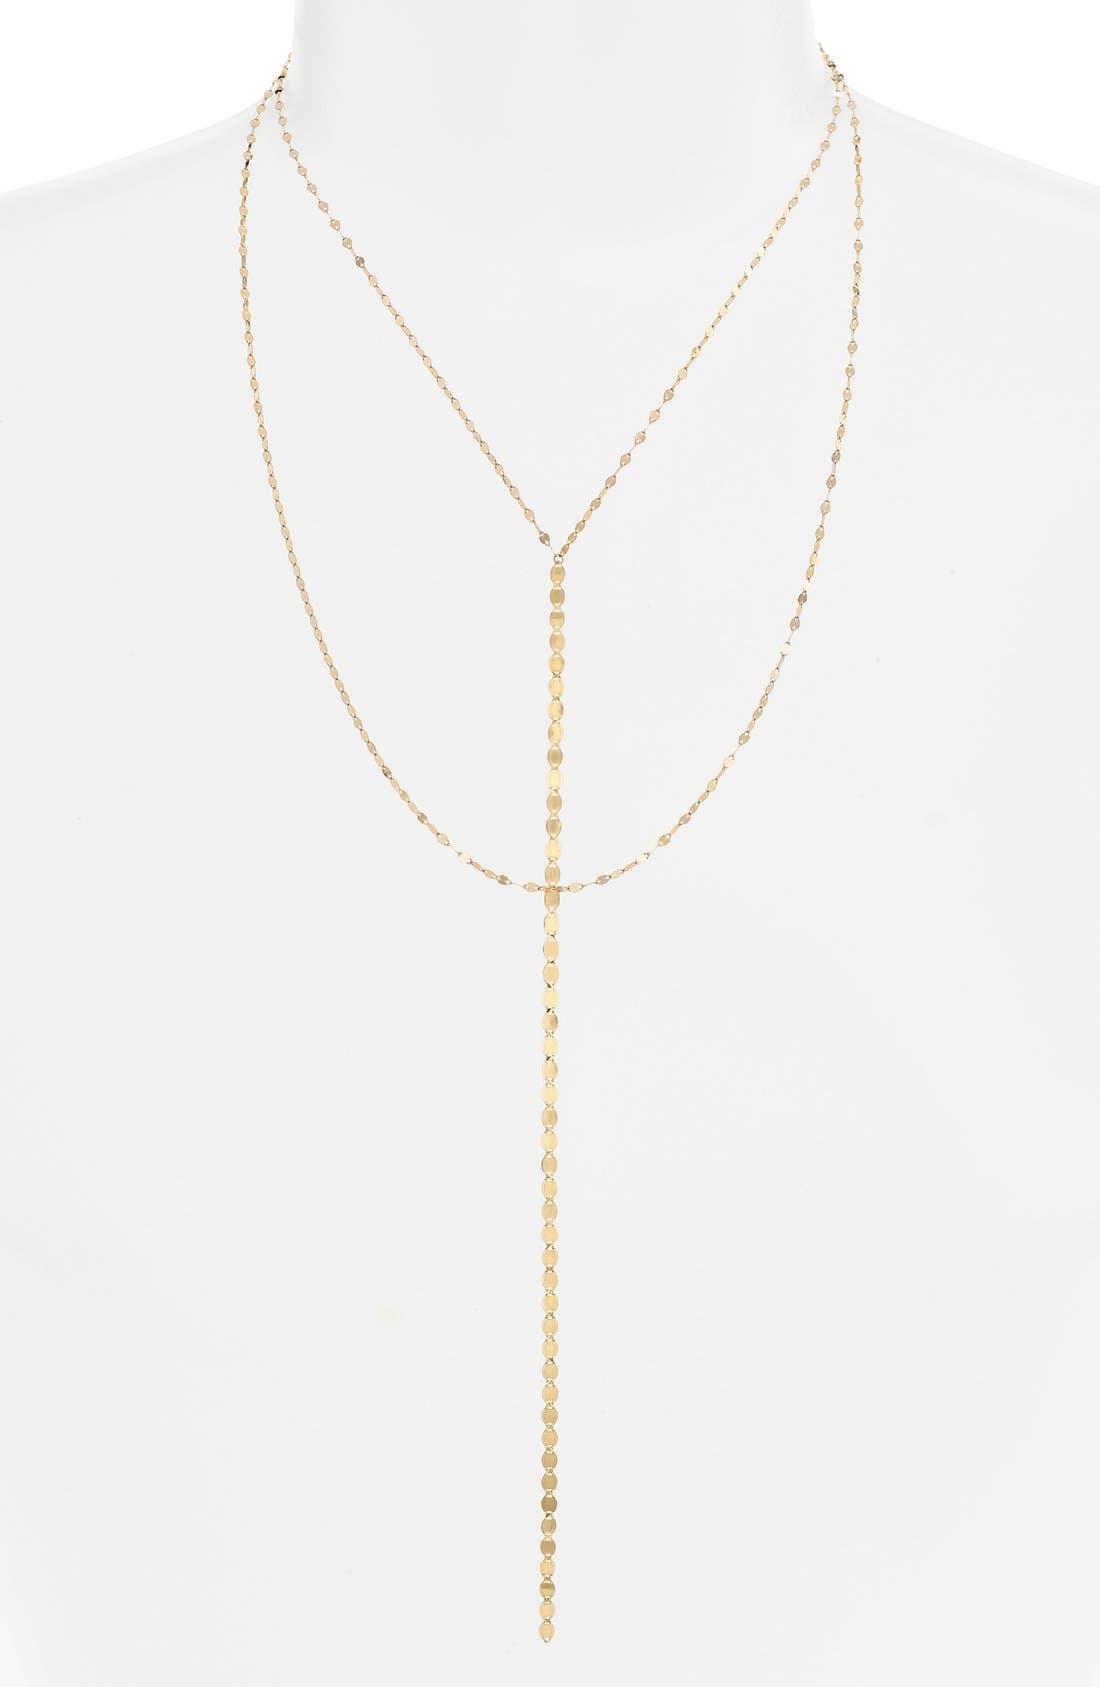 Lana Jewelry 'Nude Blake' Multistrand Drop Necklace